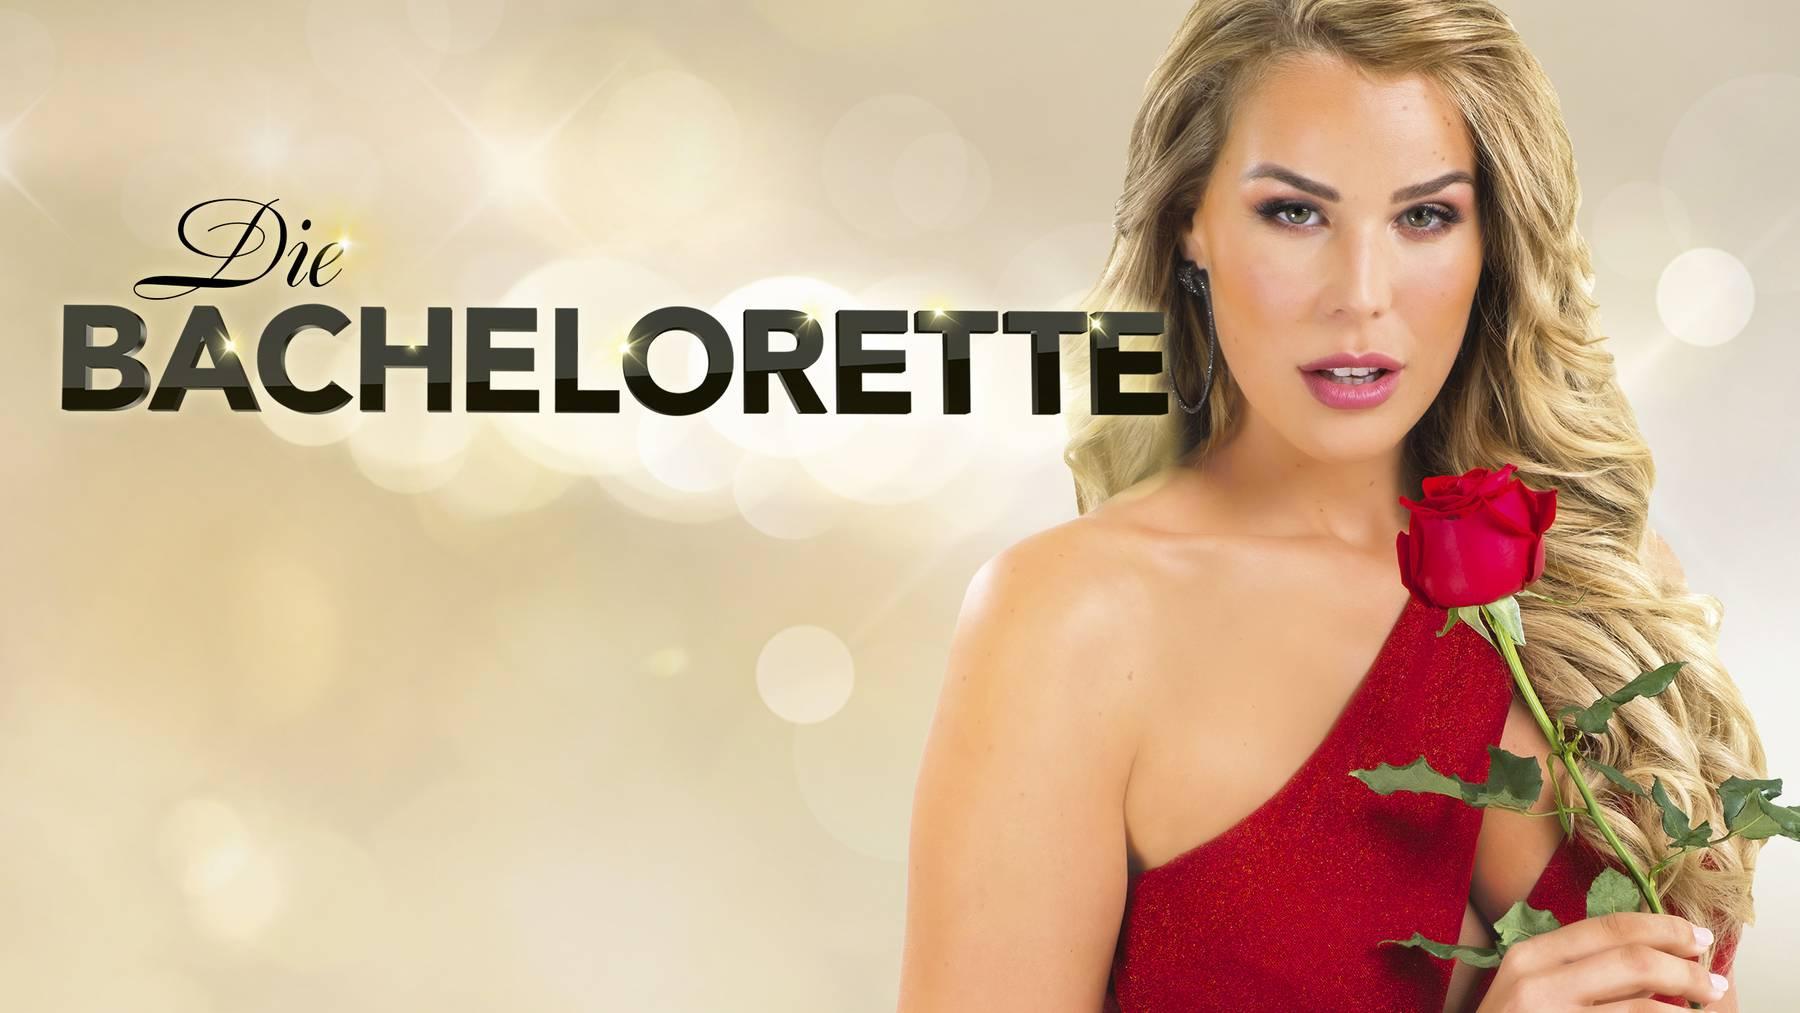 Die Bachelorette Staffel 6